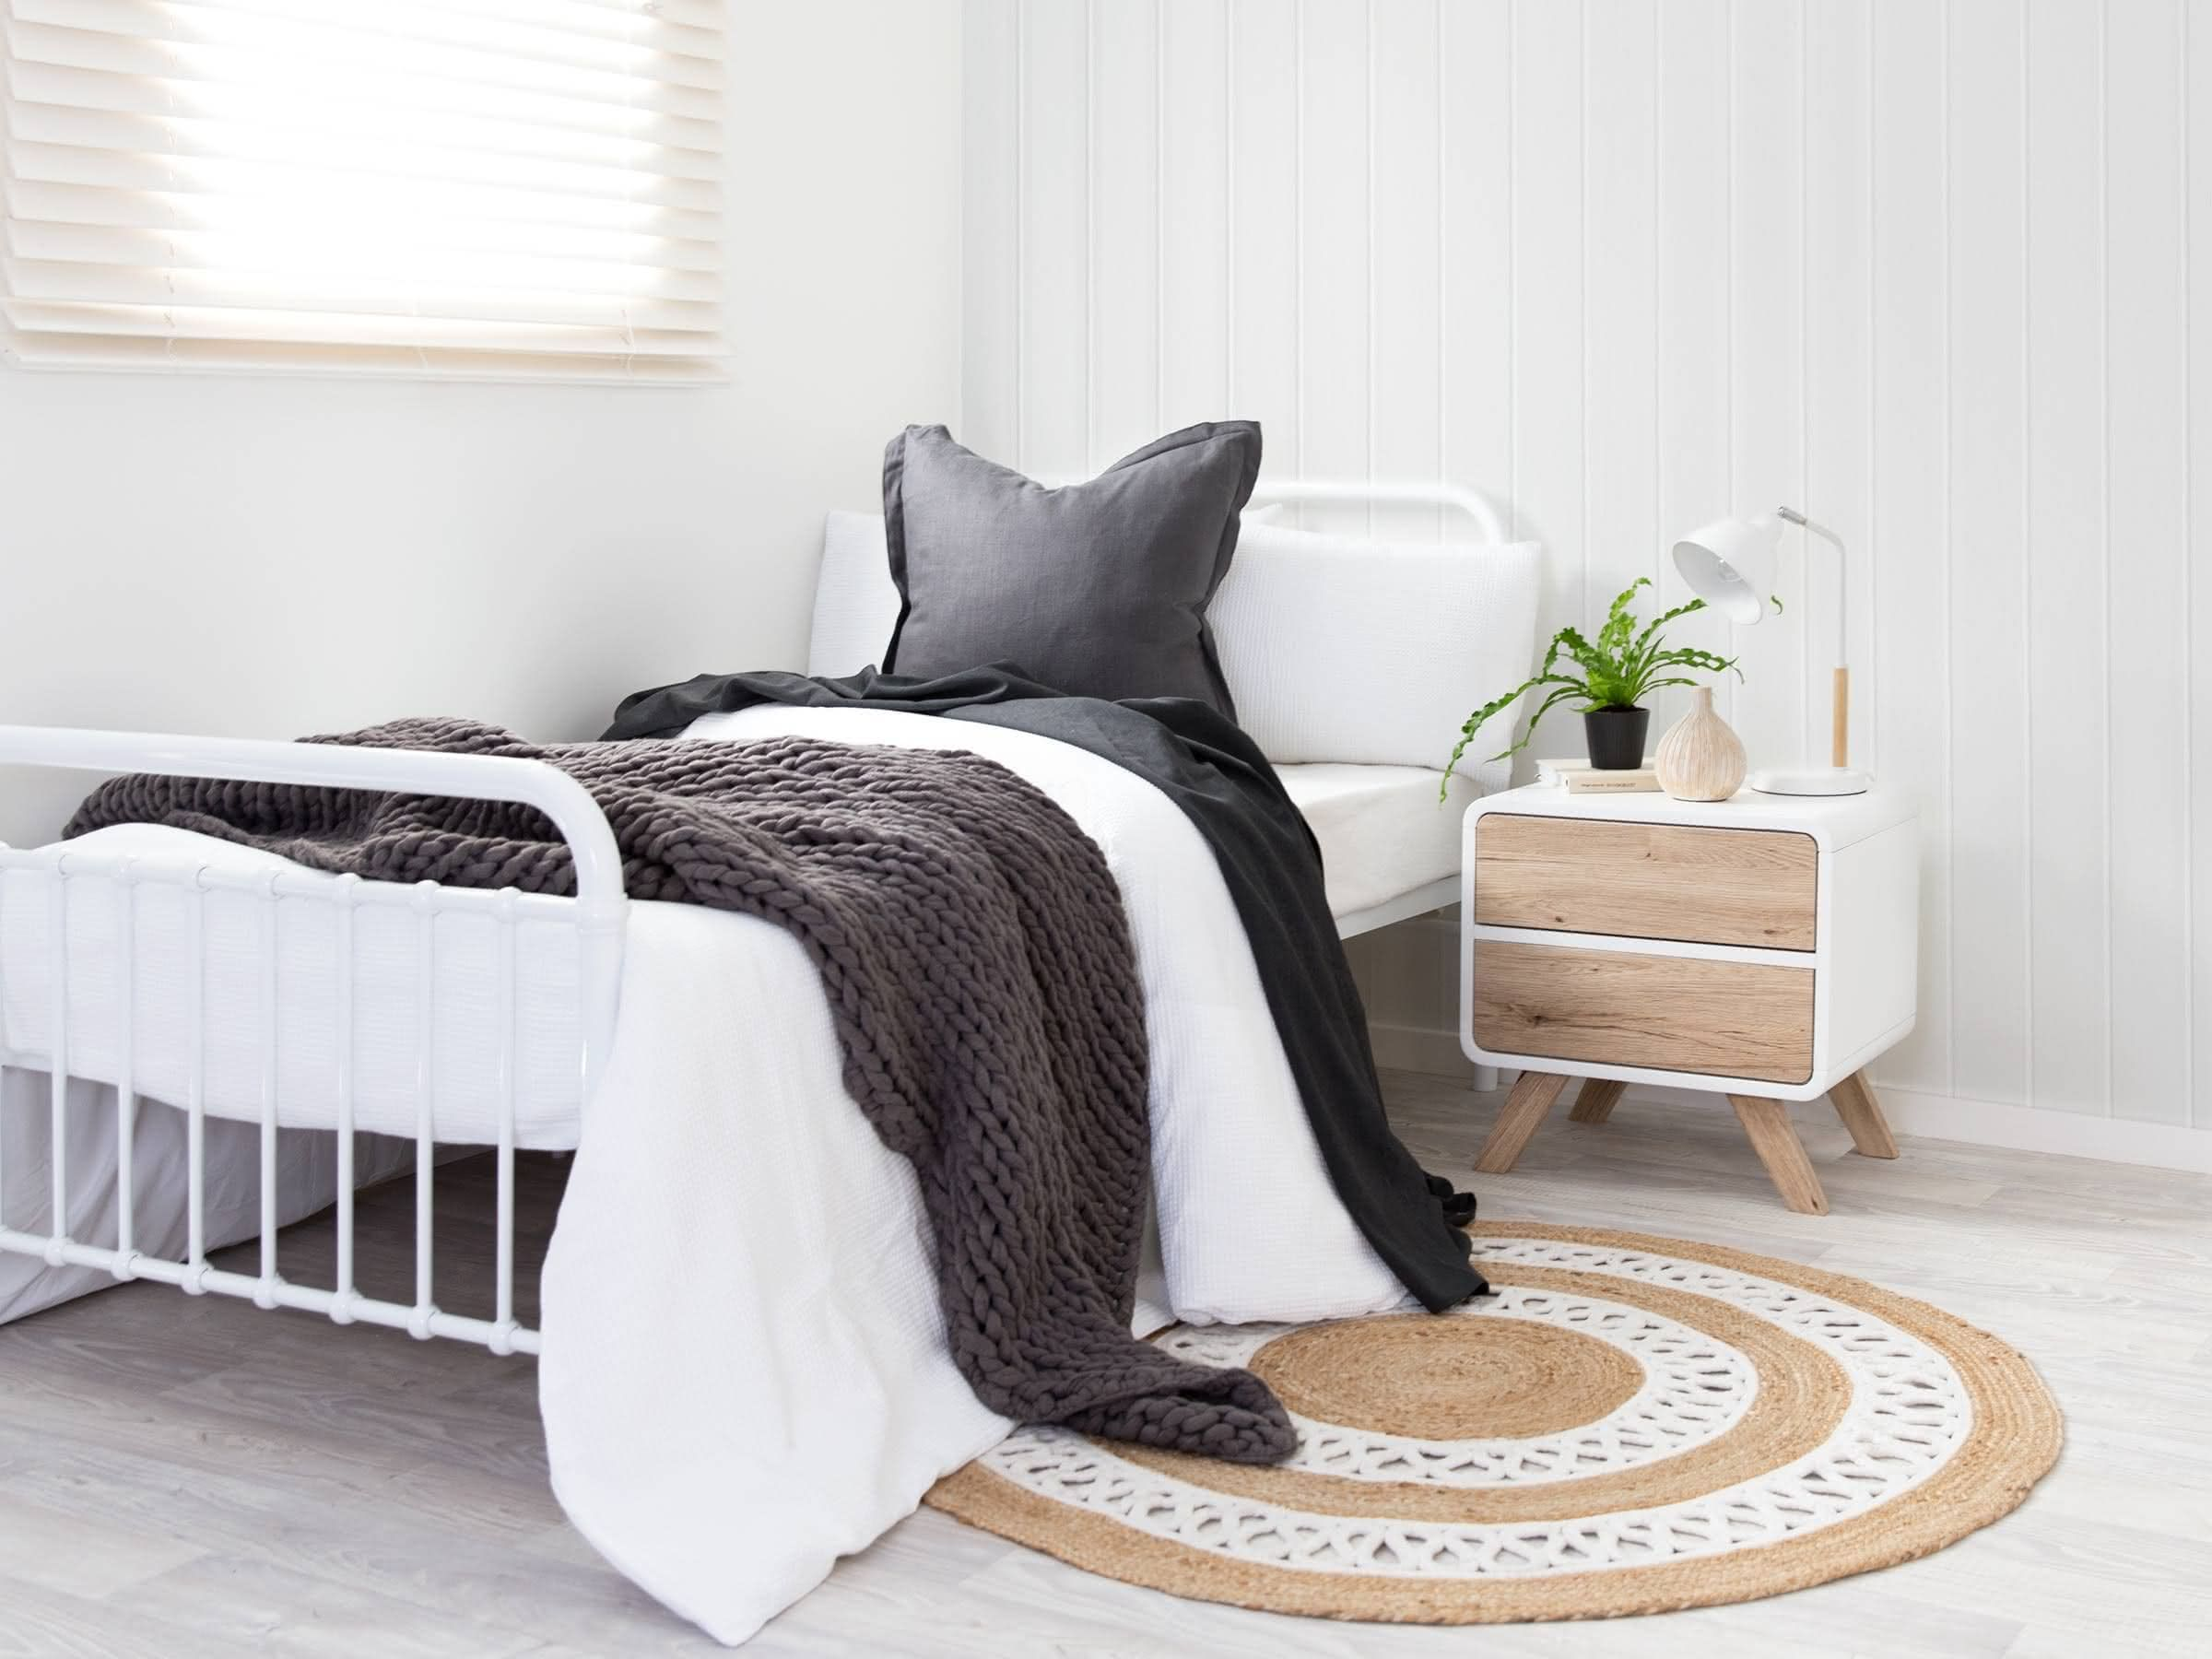 Mocka Sonata Bed Kids Bed Metal Bed Single Bed Classic Bed Vintage Bed Contemporary Bed Bedroom Furniture Bedroom Decor Ins Bedroom Design In 2019